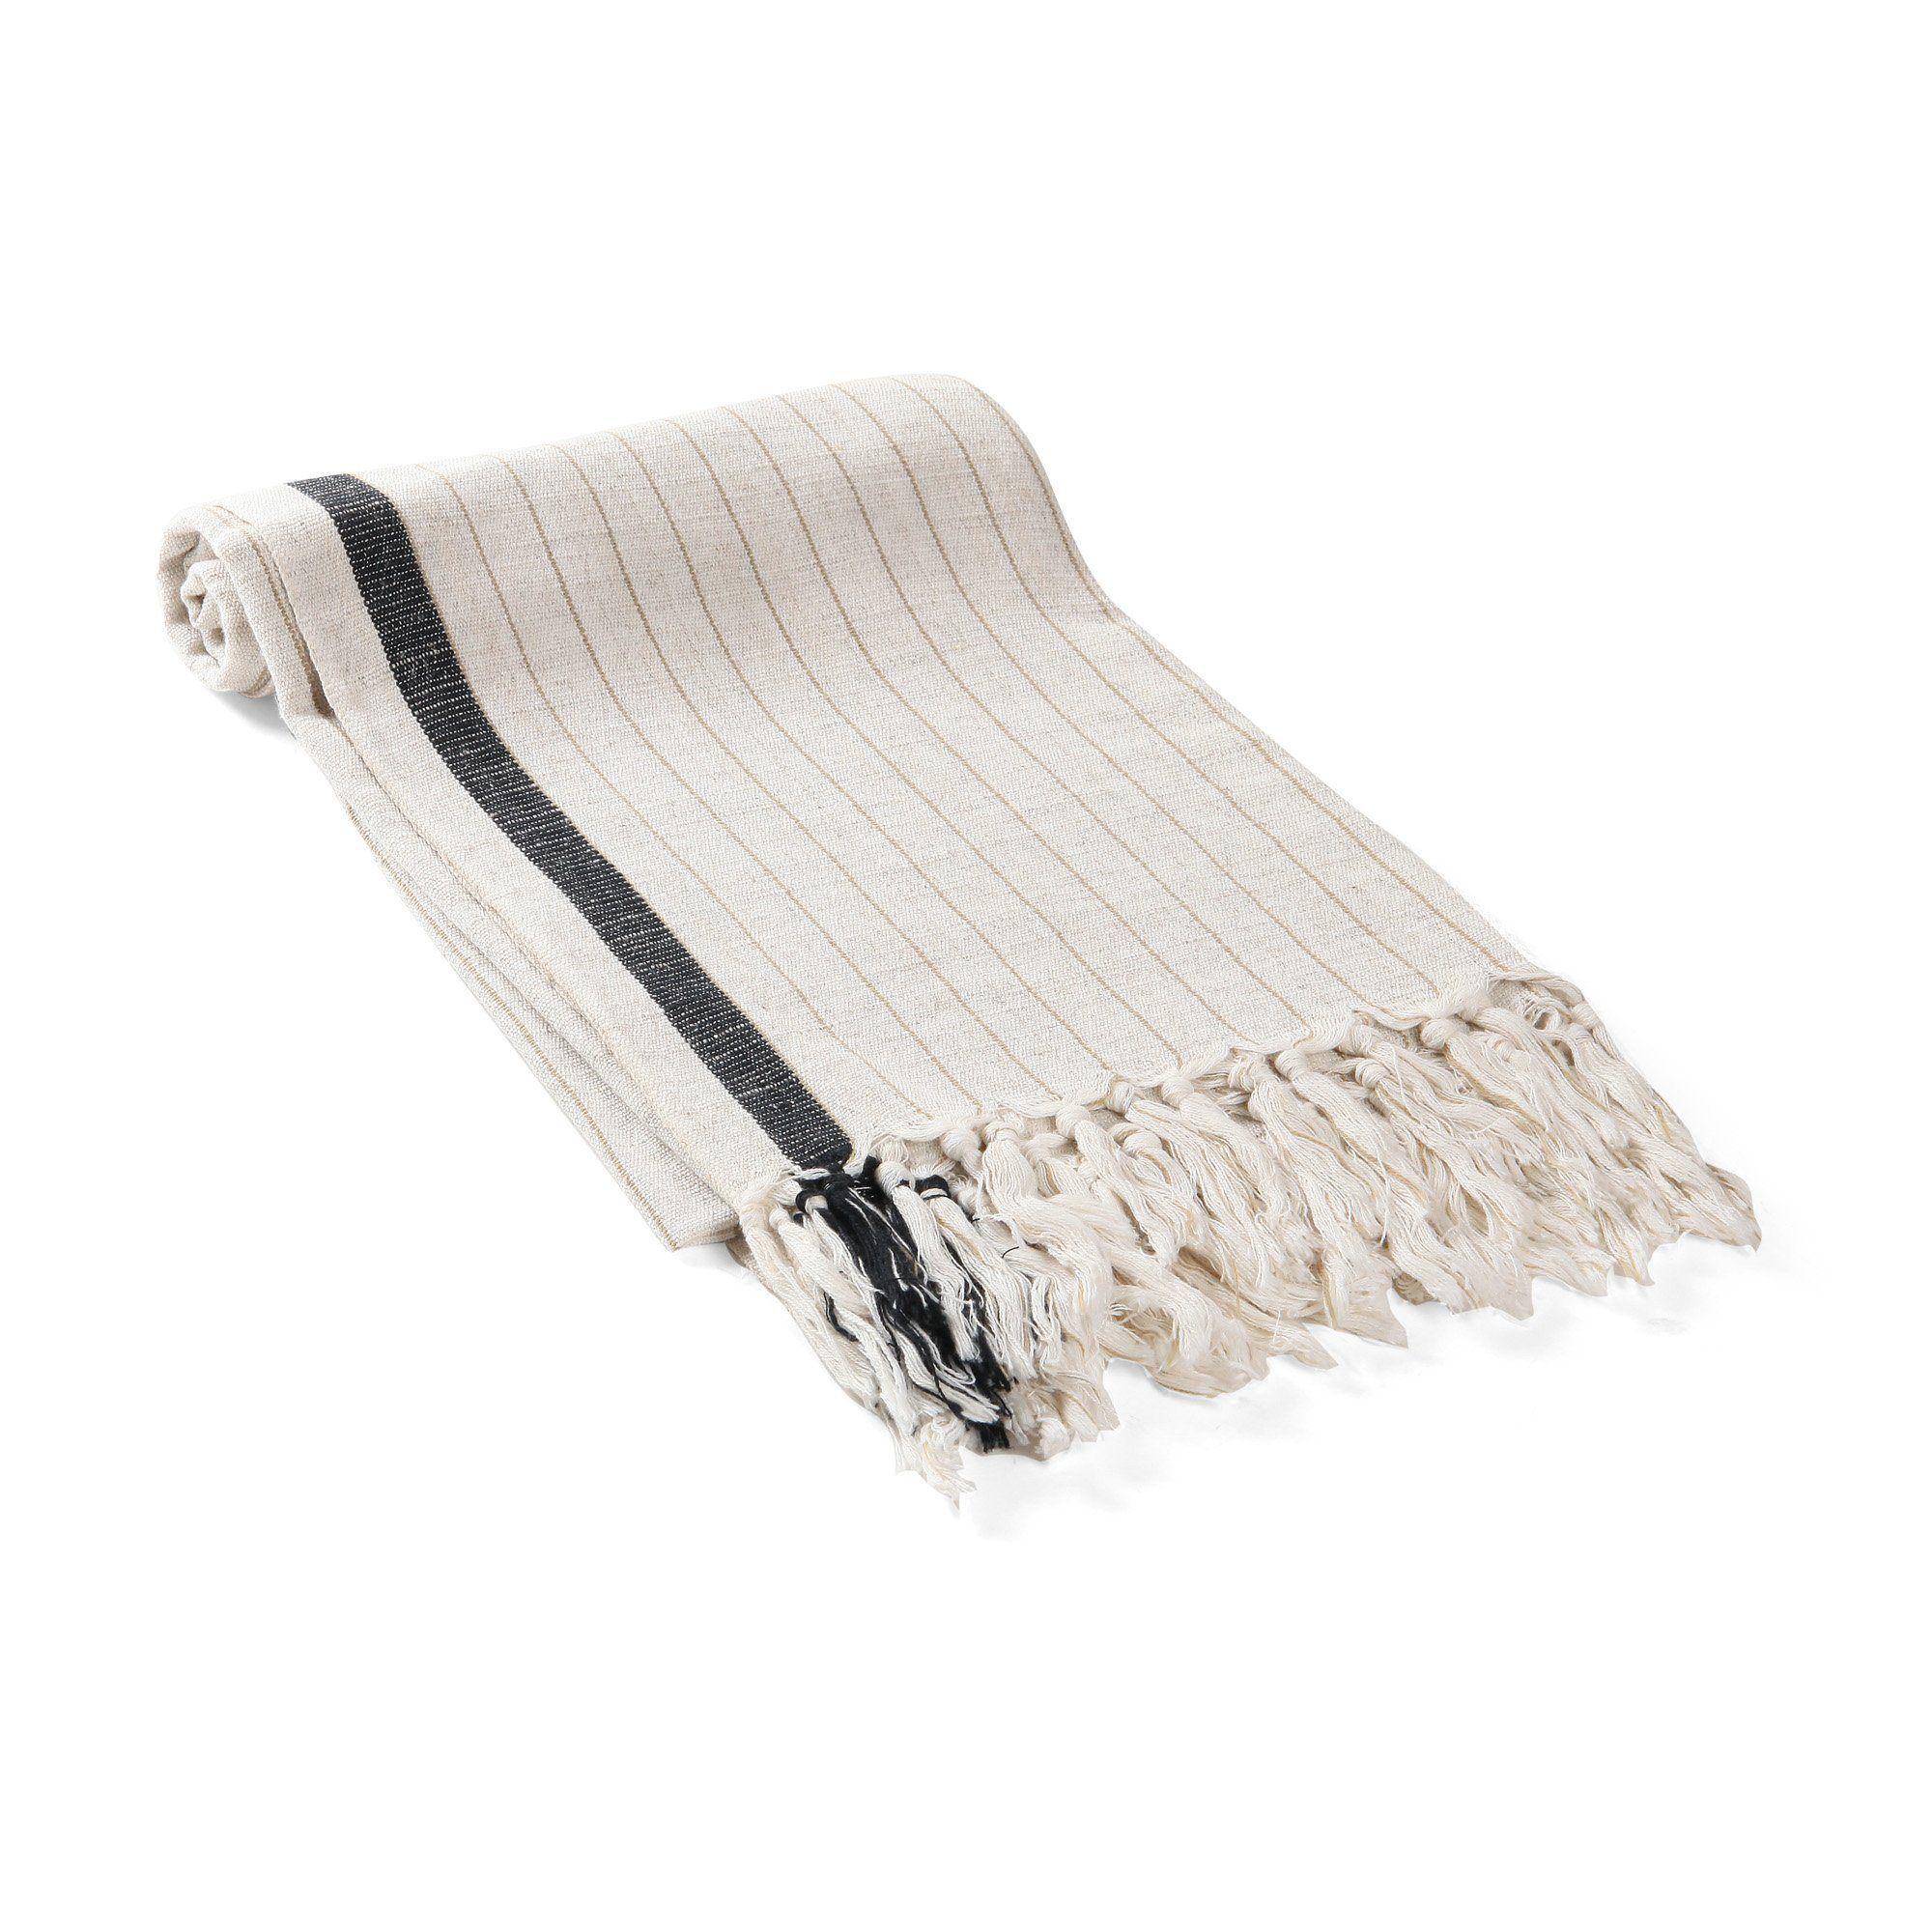 Carson Paisley Beach Towel Blanket